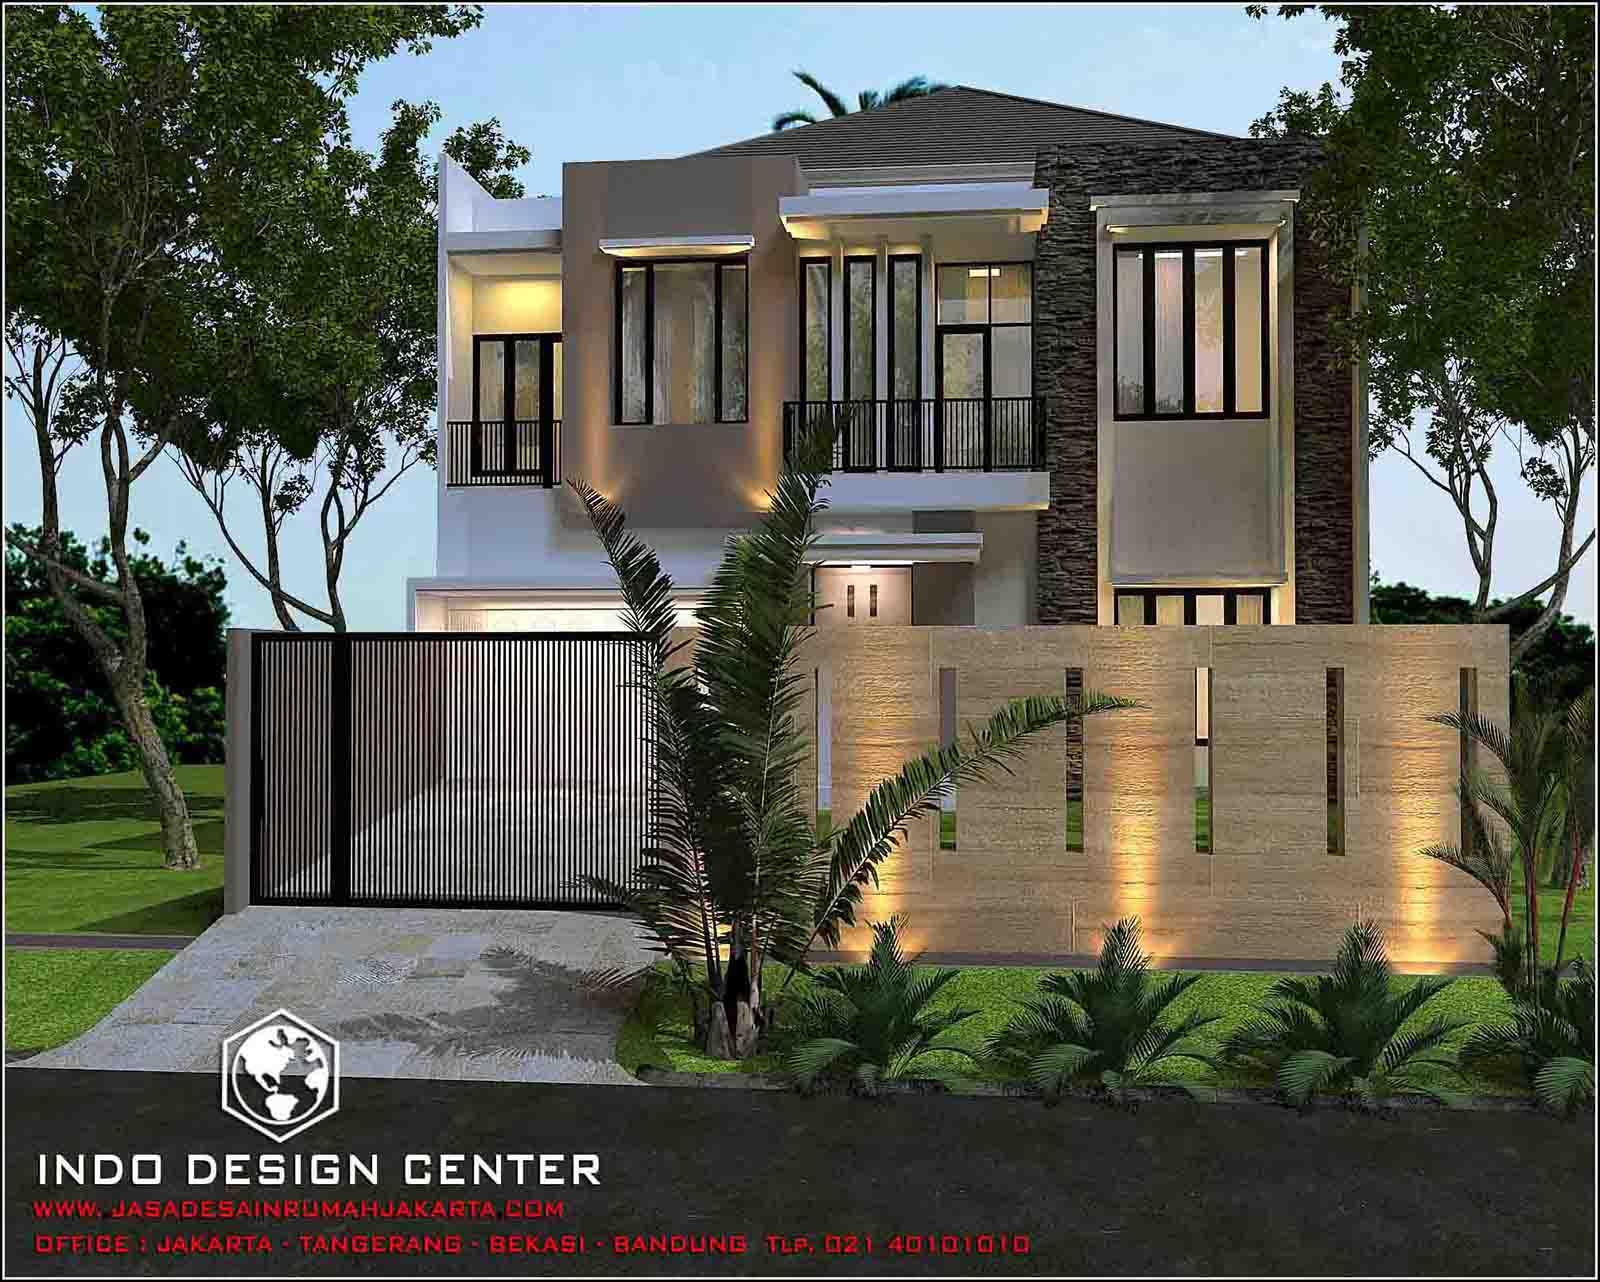 Rumah Minimalis 2 Lantai Modern Arsip Jasa Desain Rumah Jakarta